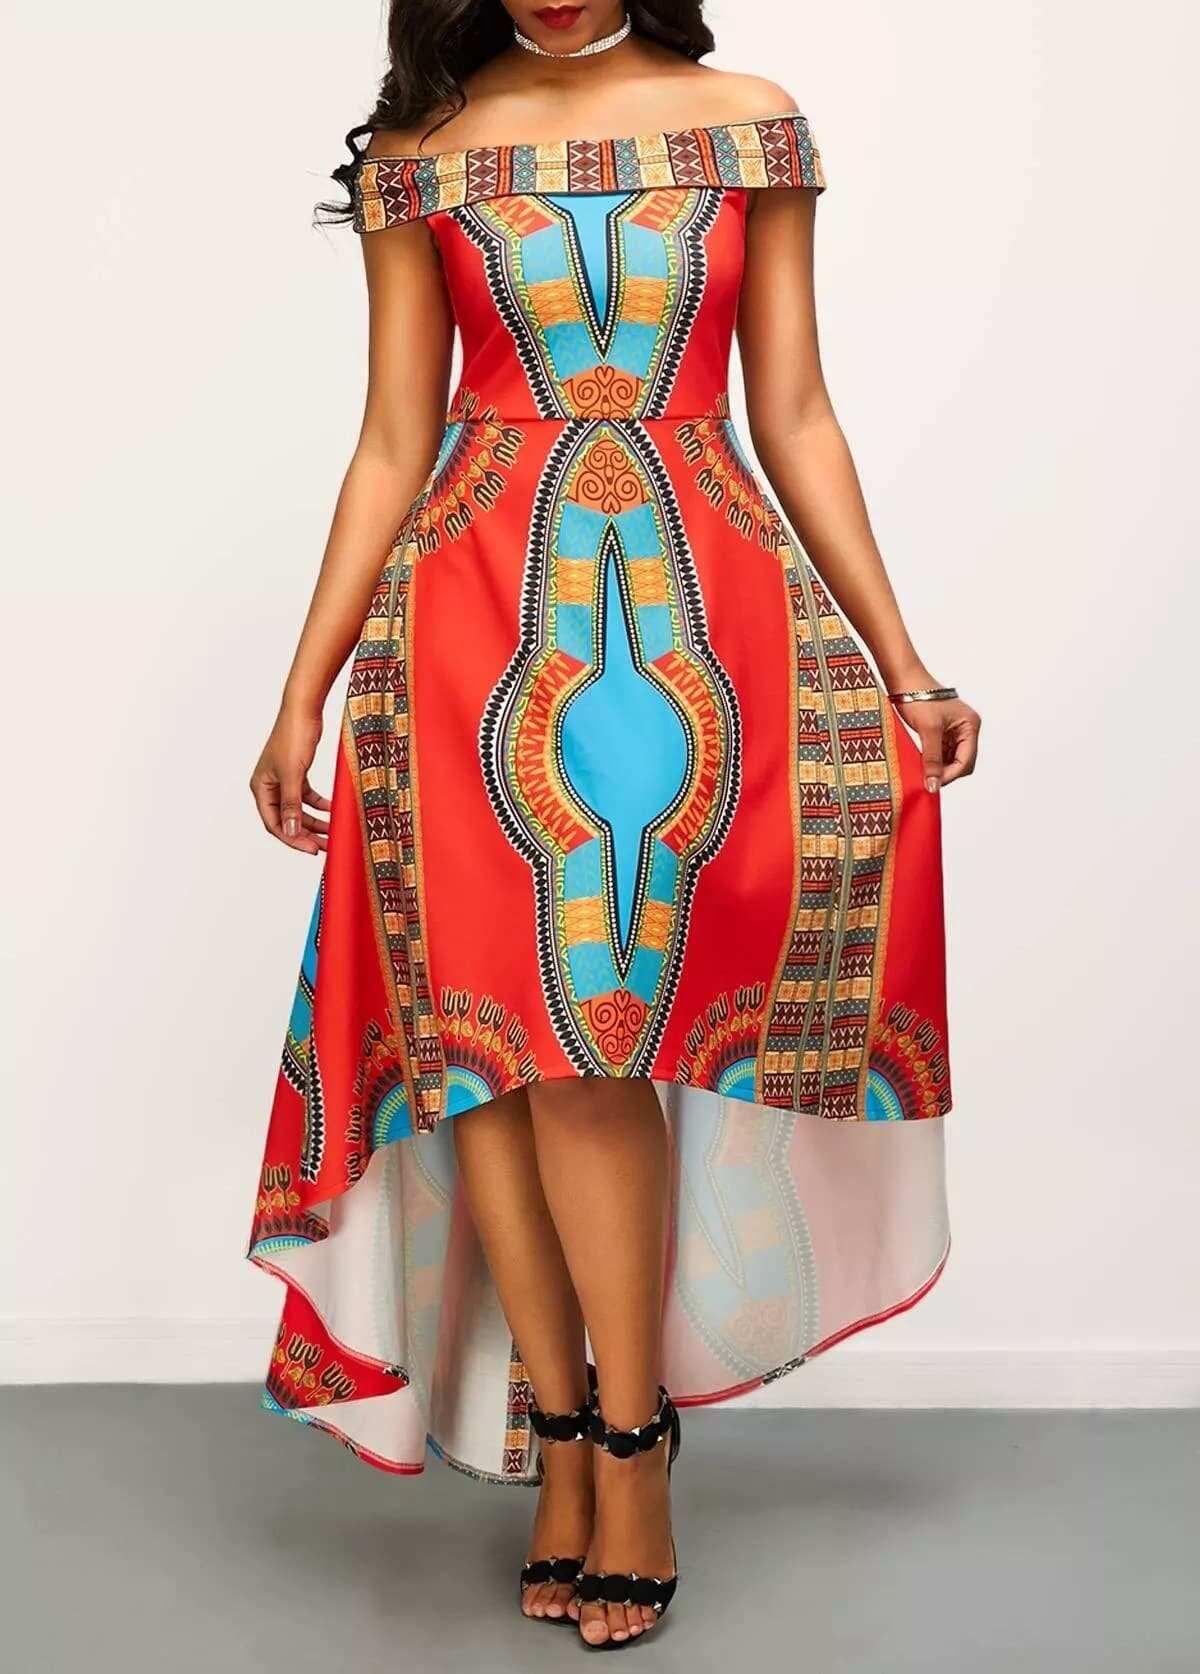 dashiki dress, dashiki designs, dashiki dress styles